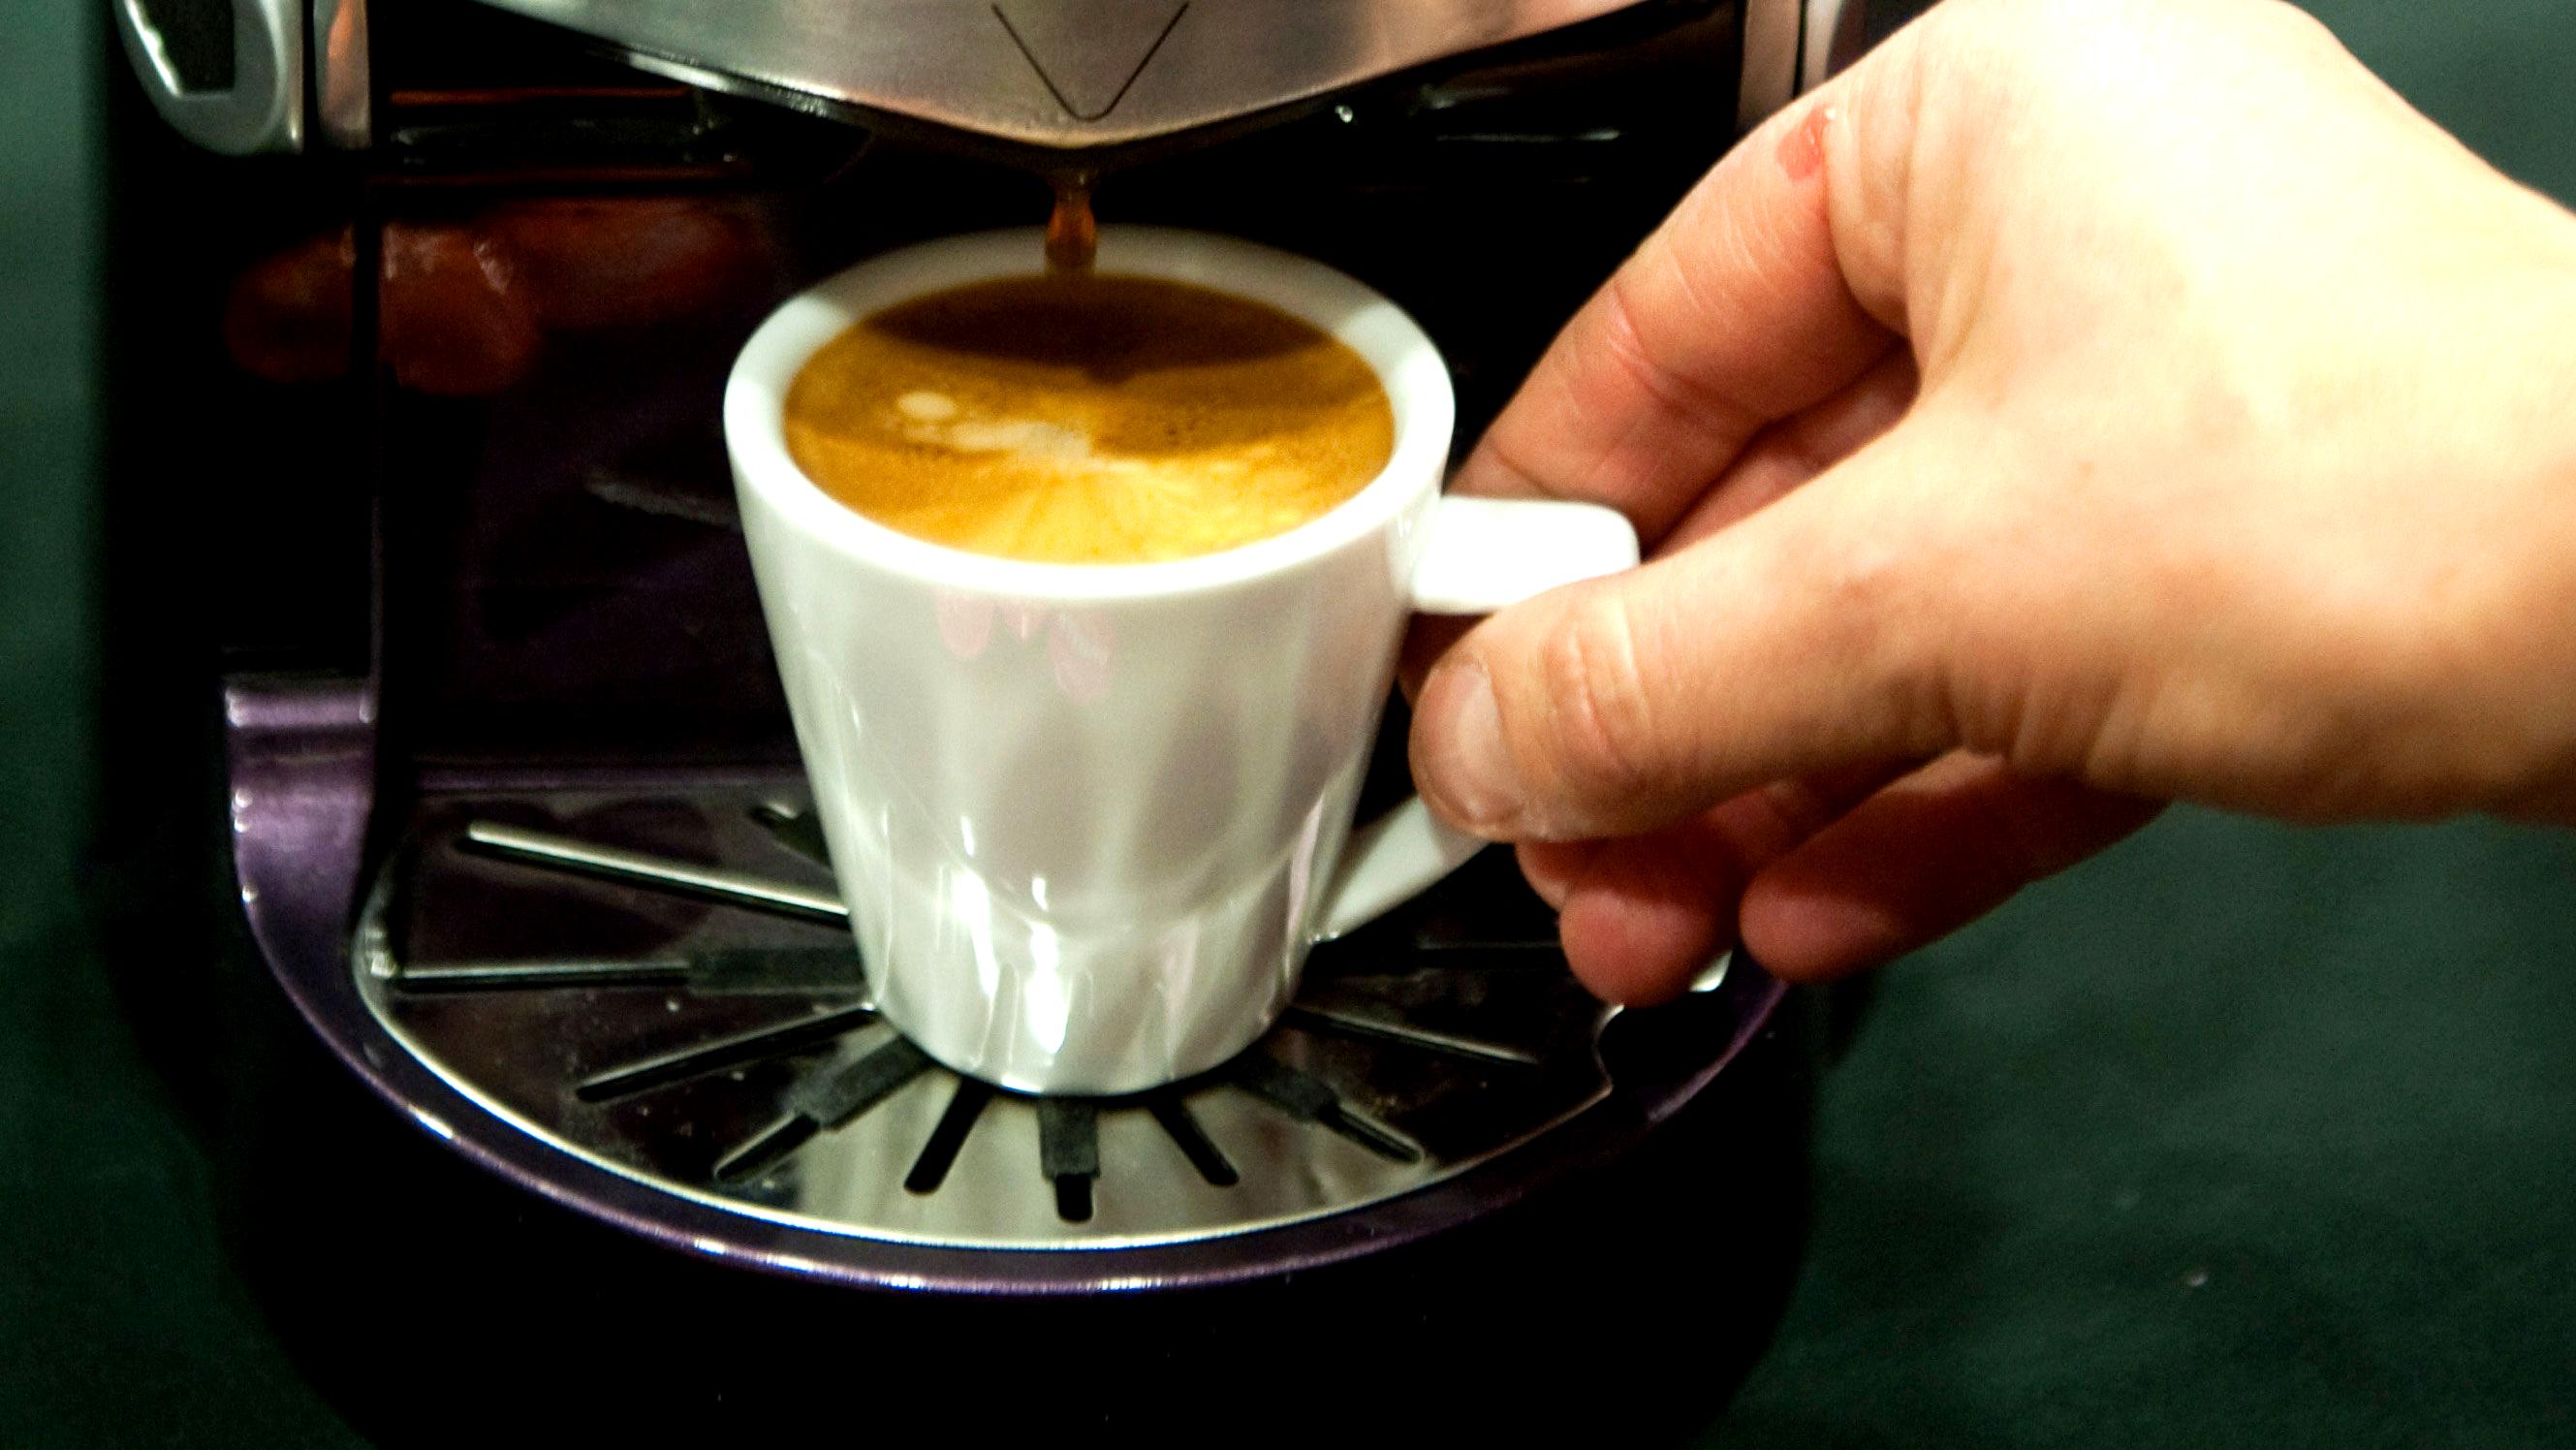 Mer kaffe minskar risken for diabetes